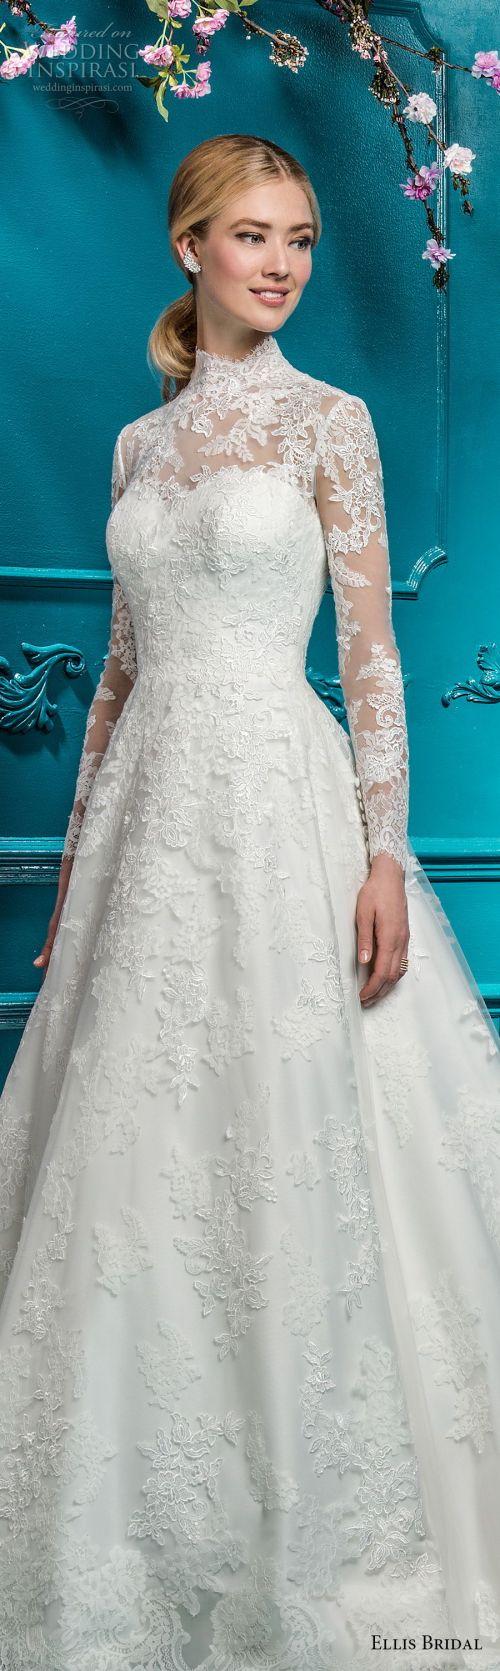 Medium Of Royal Wedding Dress